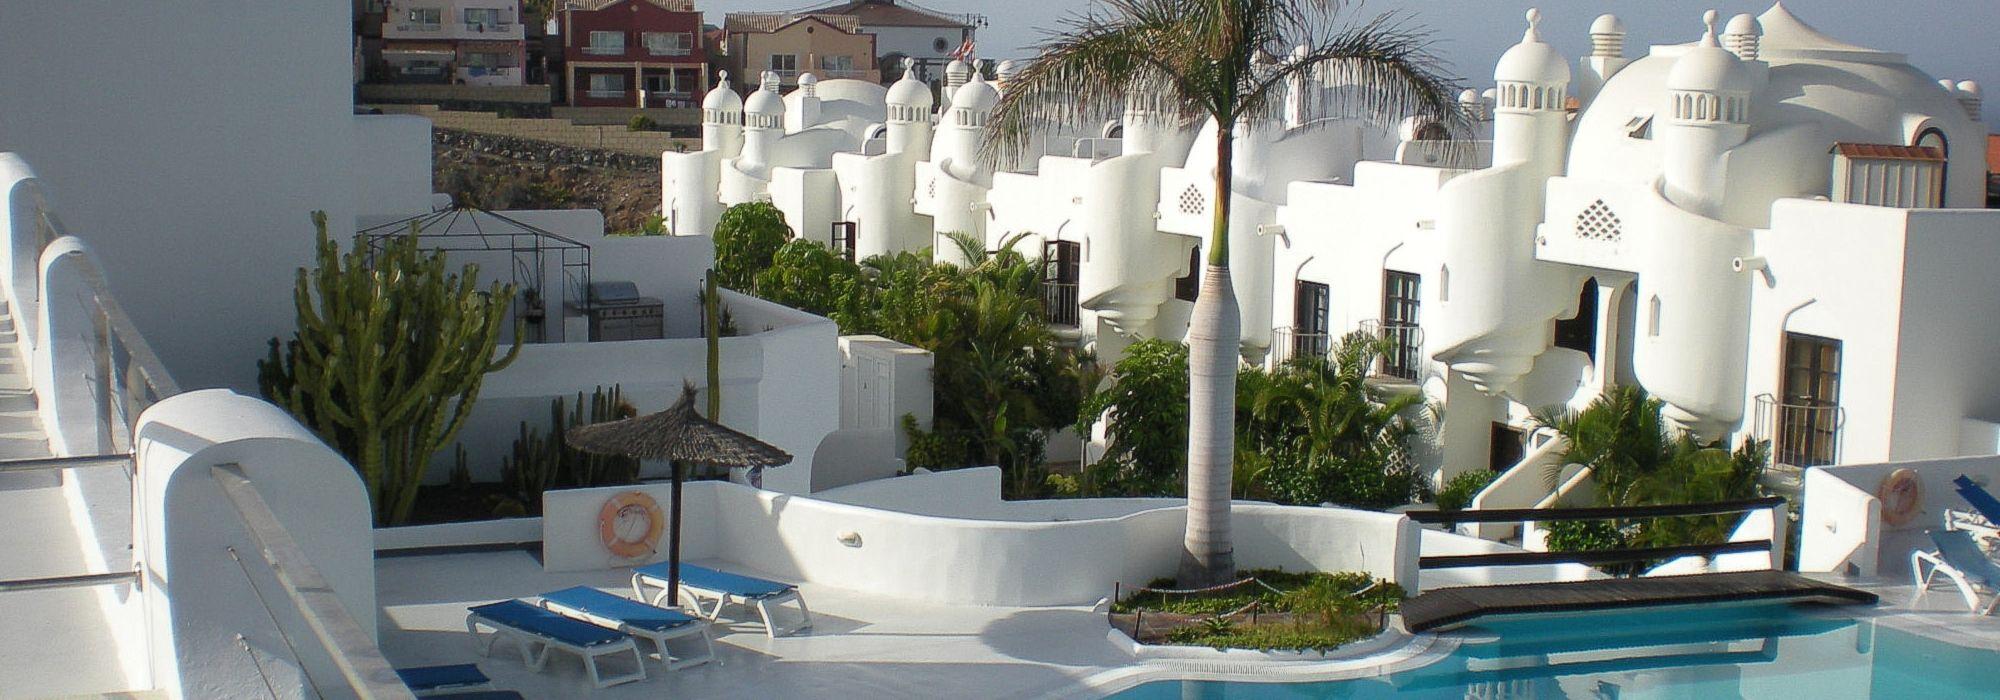 Villetta in residence a Playa Paraiso – Tenerife SUD